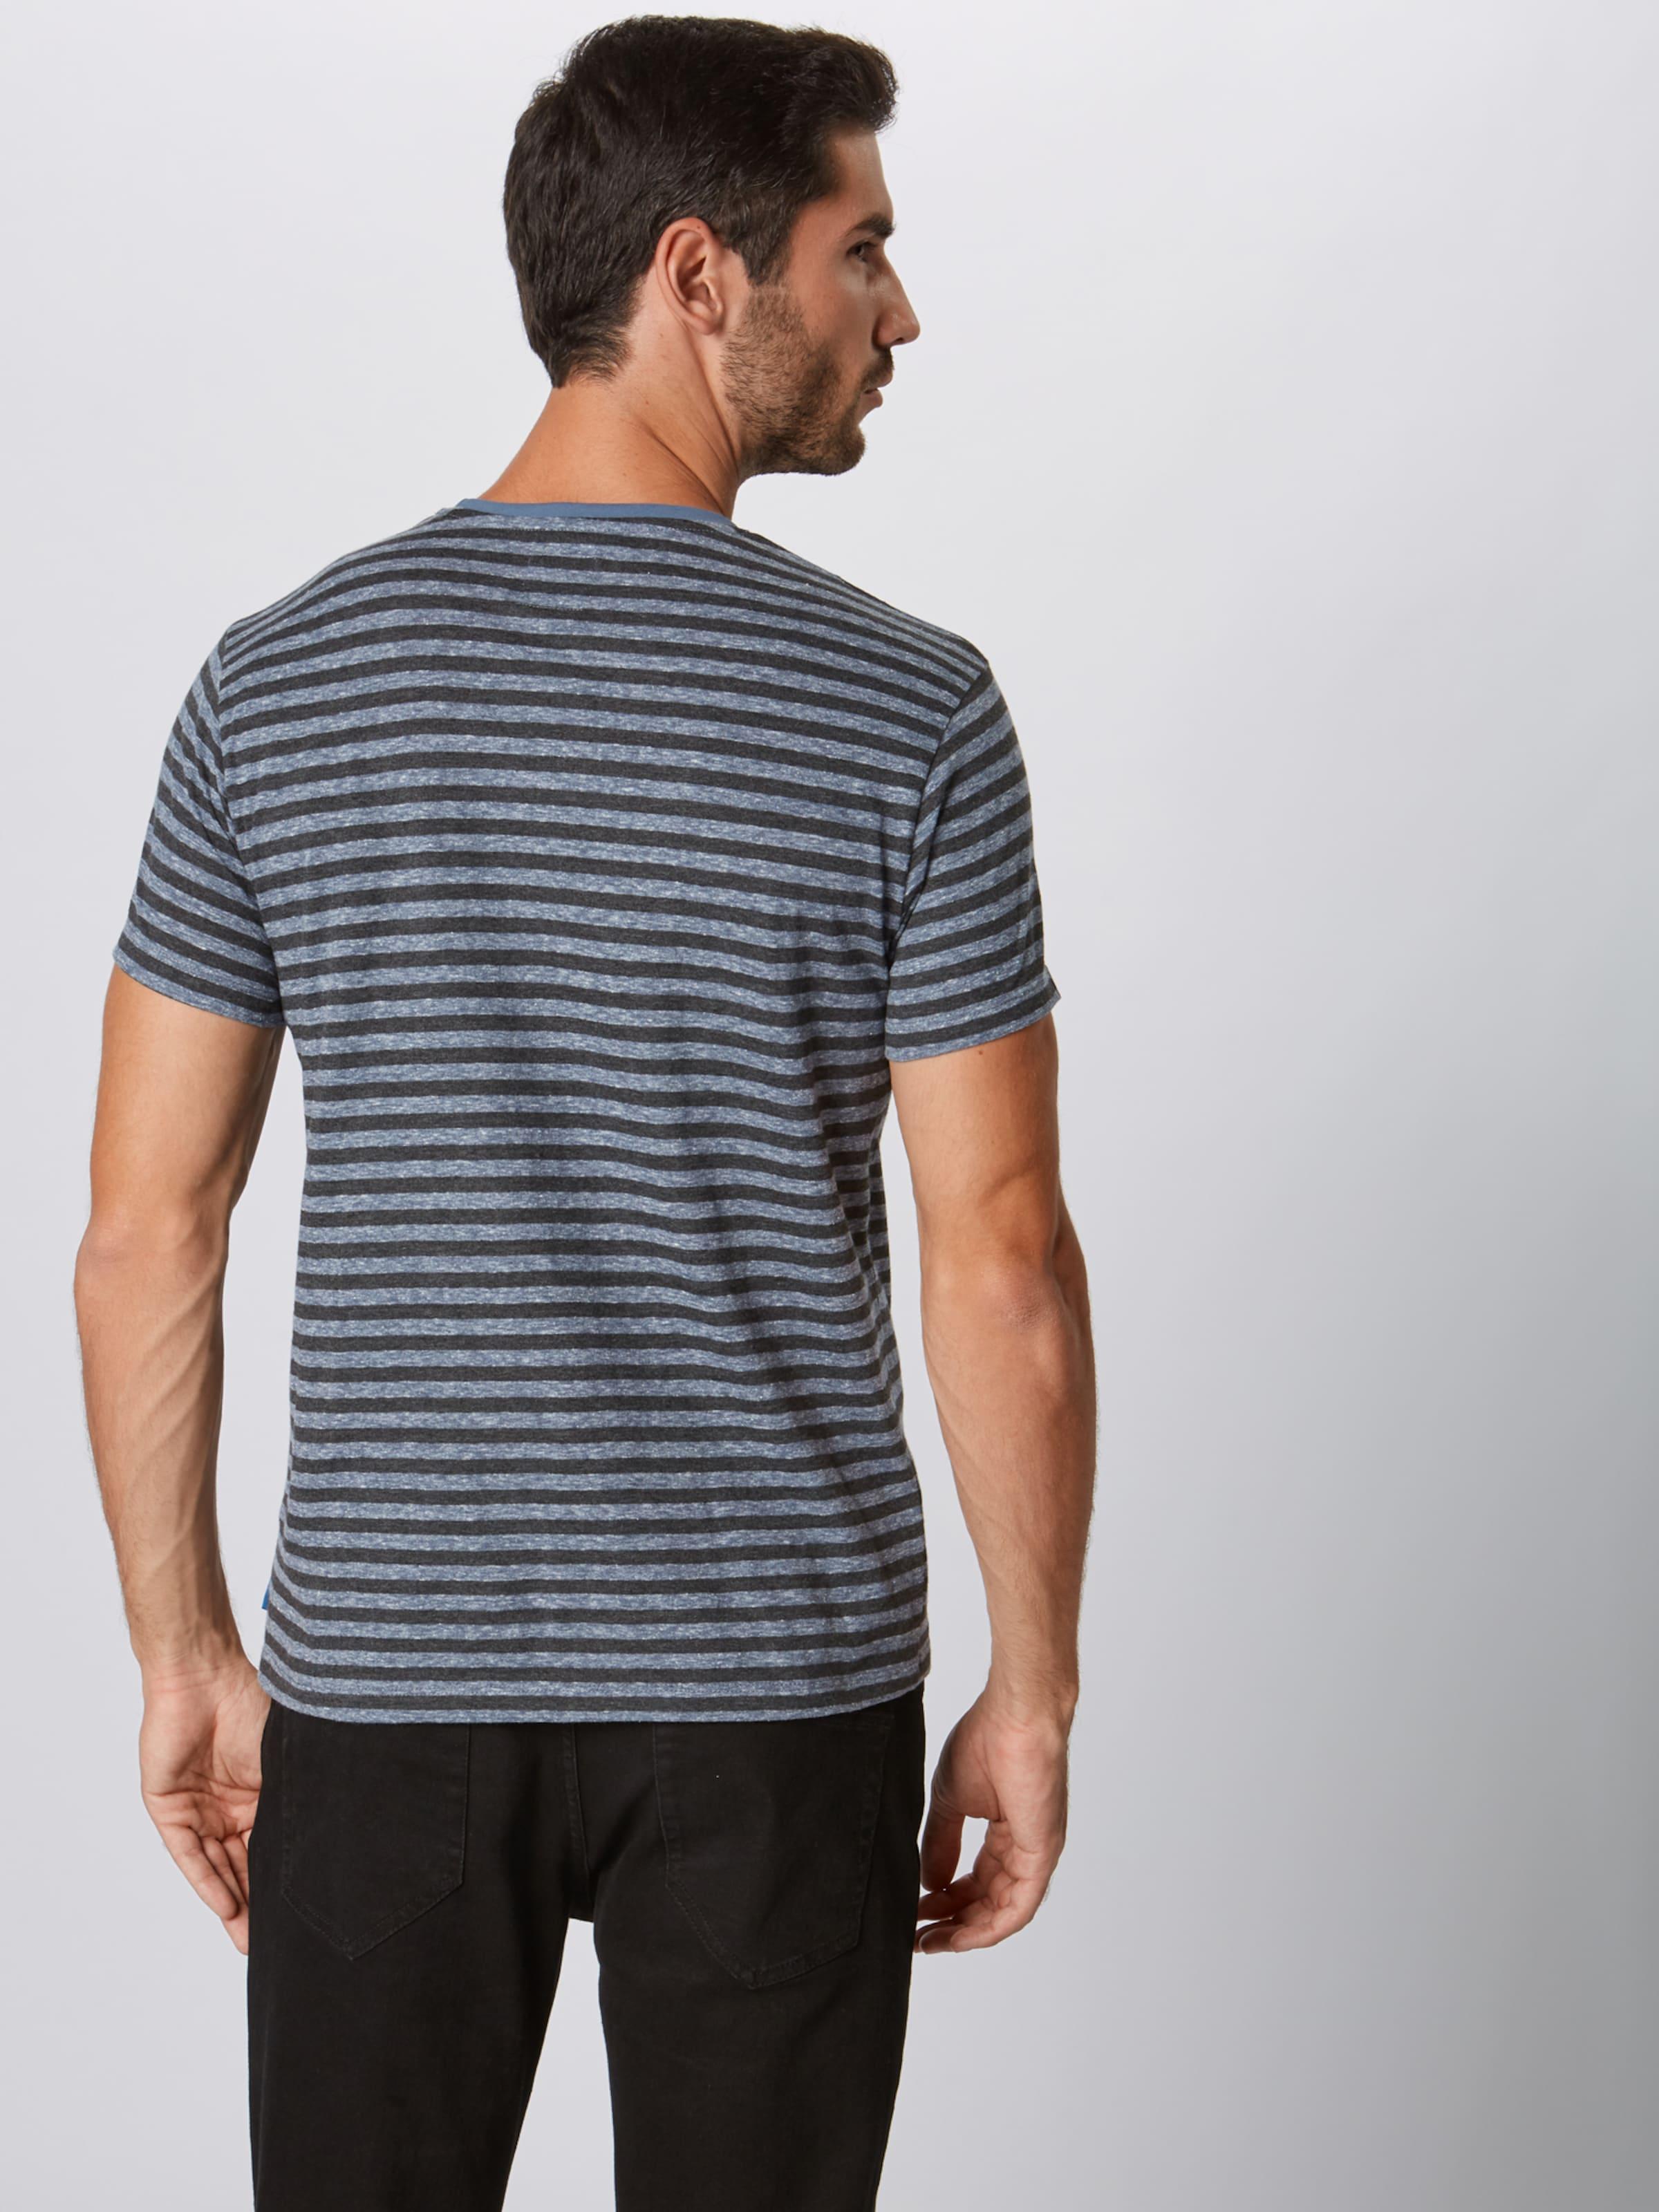 BlauGrau In Shirt 089cc2k014' Edc By Esprit 'sg Tu1FKlJc3